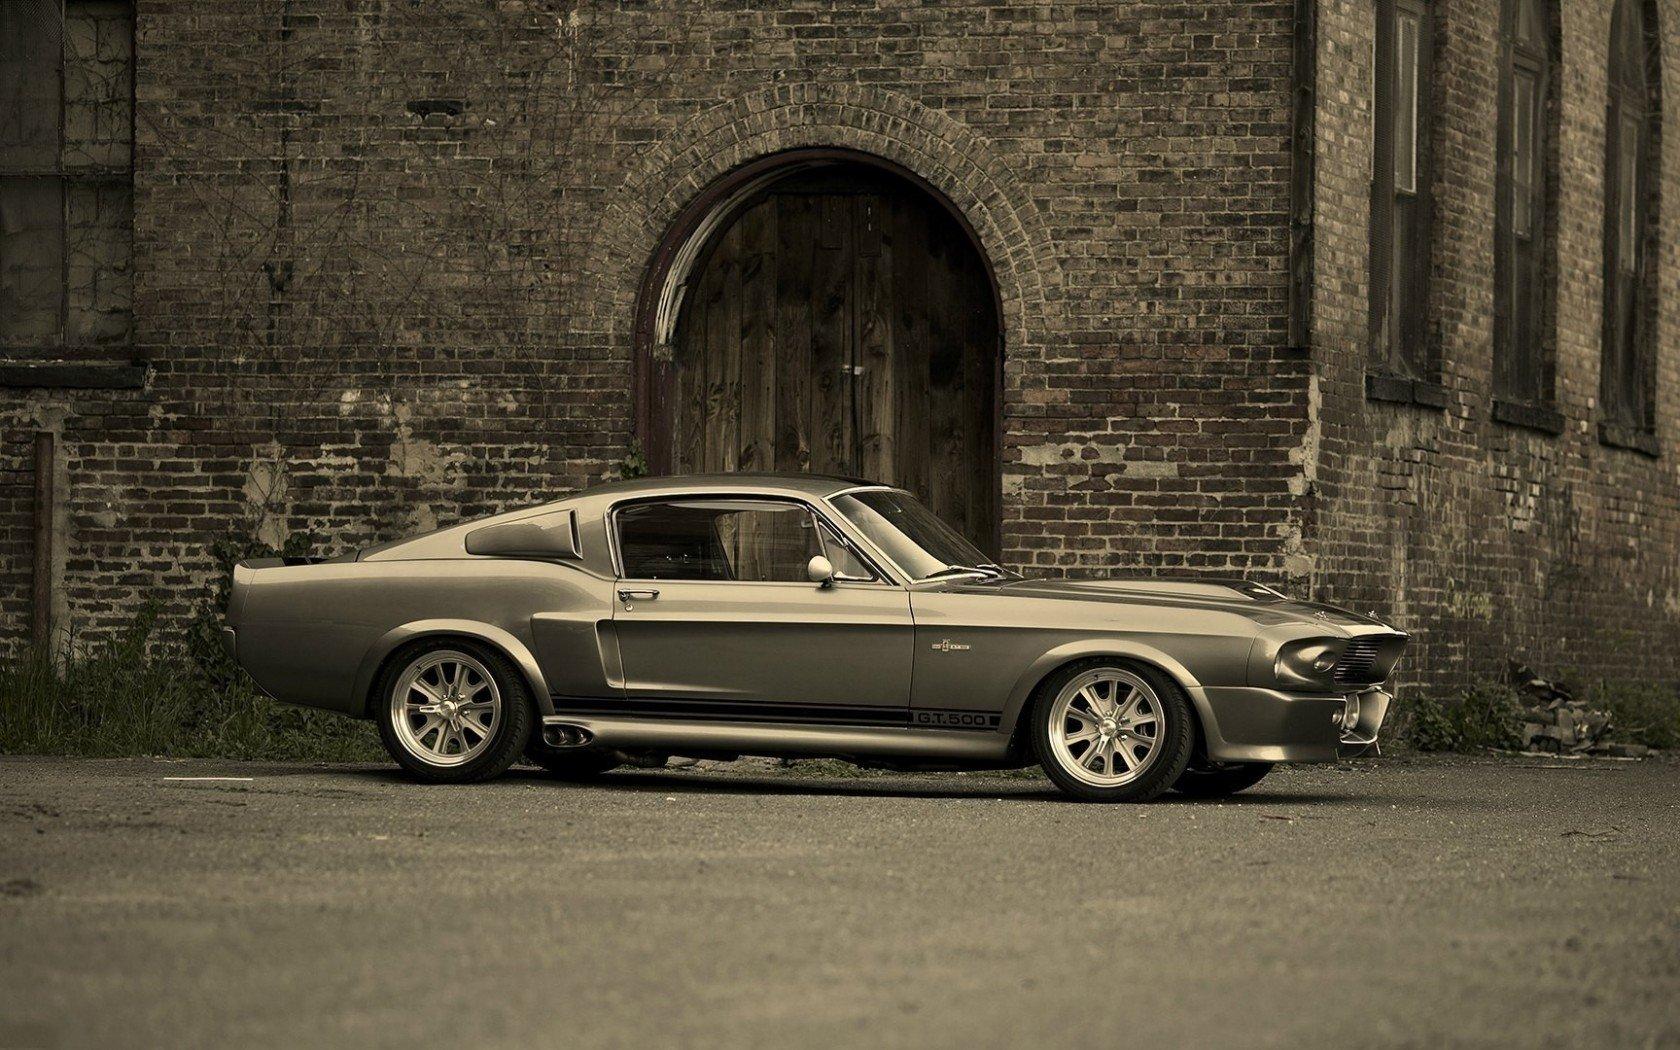 [47+] Red Mustang GT500 Eleanor Wallpaper on WallpaperSafari